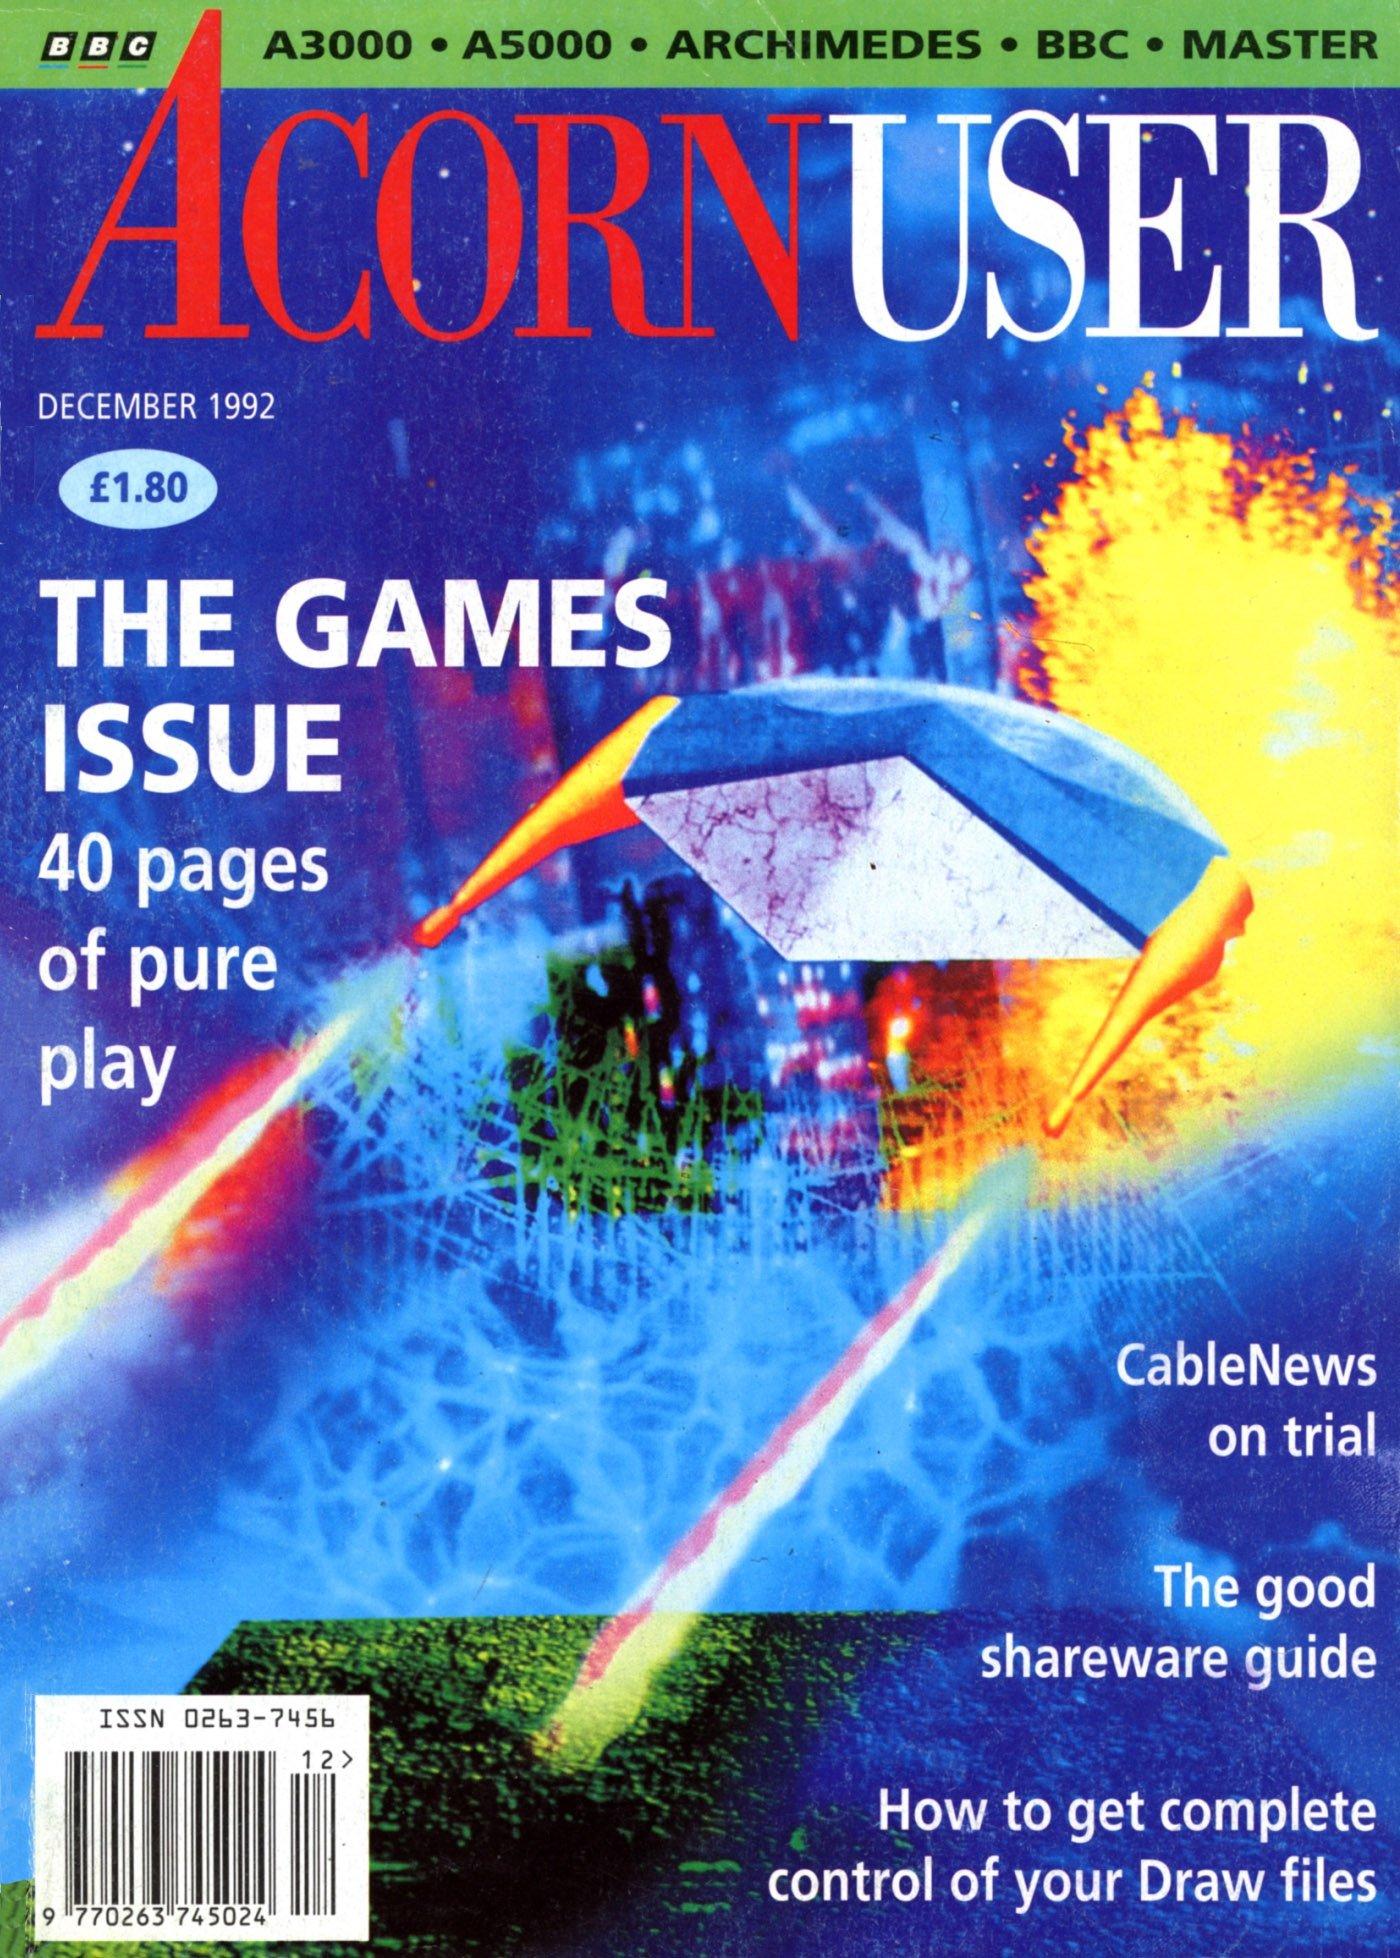 Acorn User 125 (December 1992)